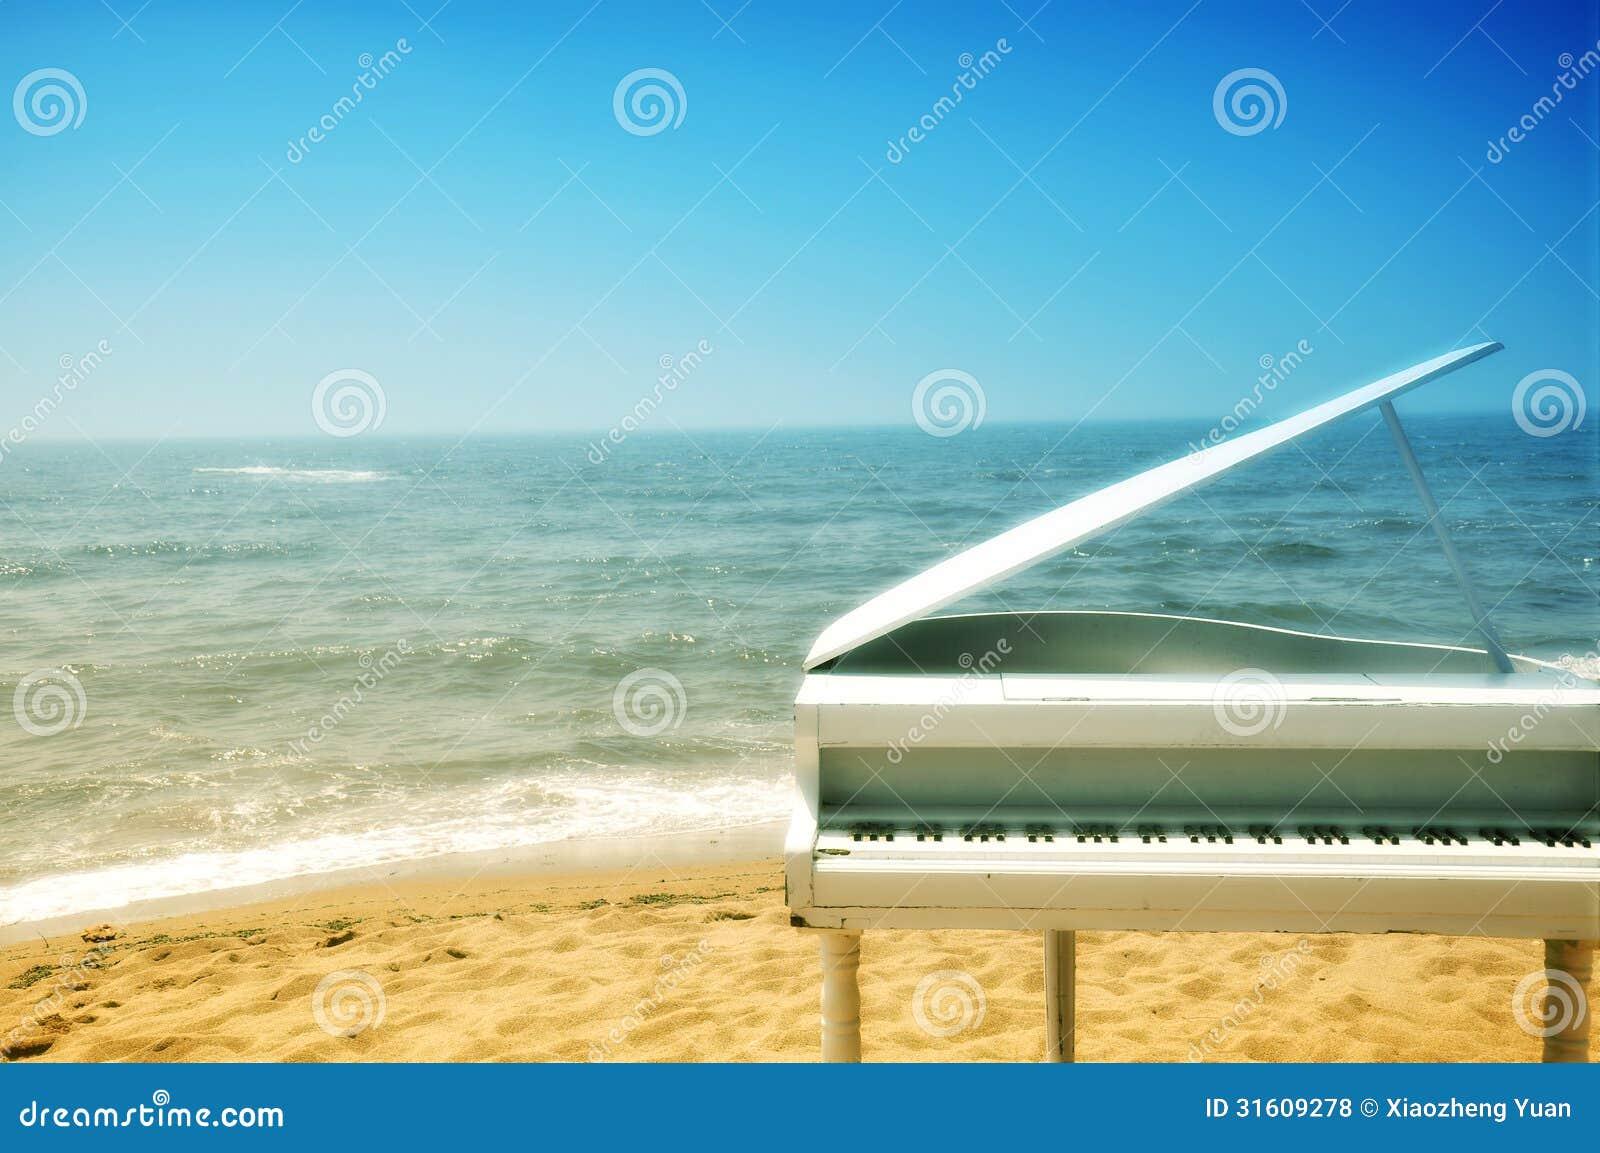 ... photography base in the scenery, seaside piano, romantic fantasy